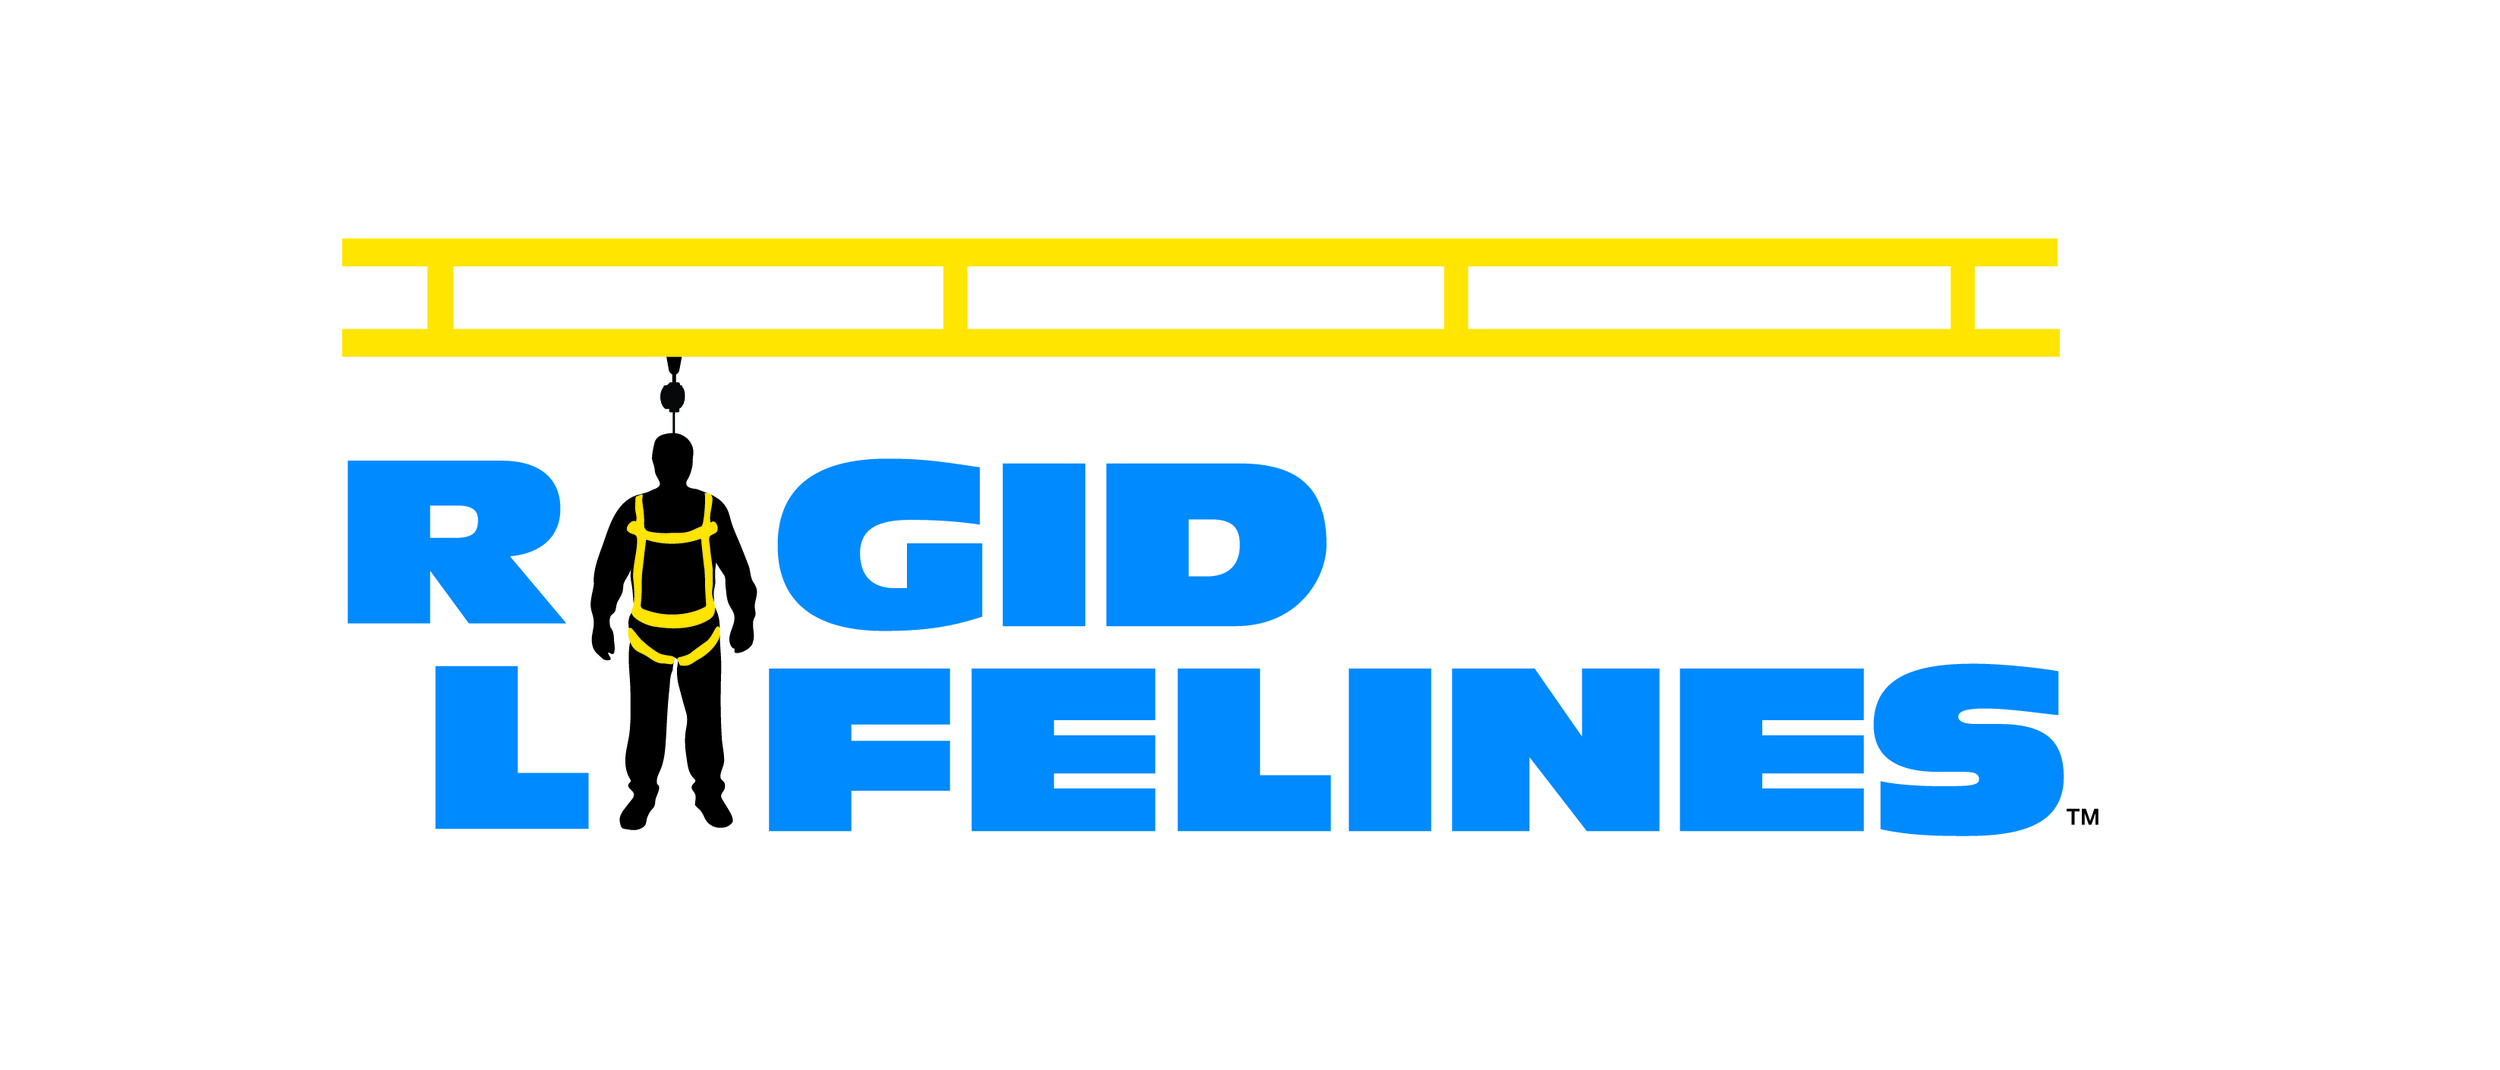 Rigid_Lifelines logo.jpg